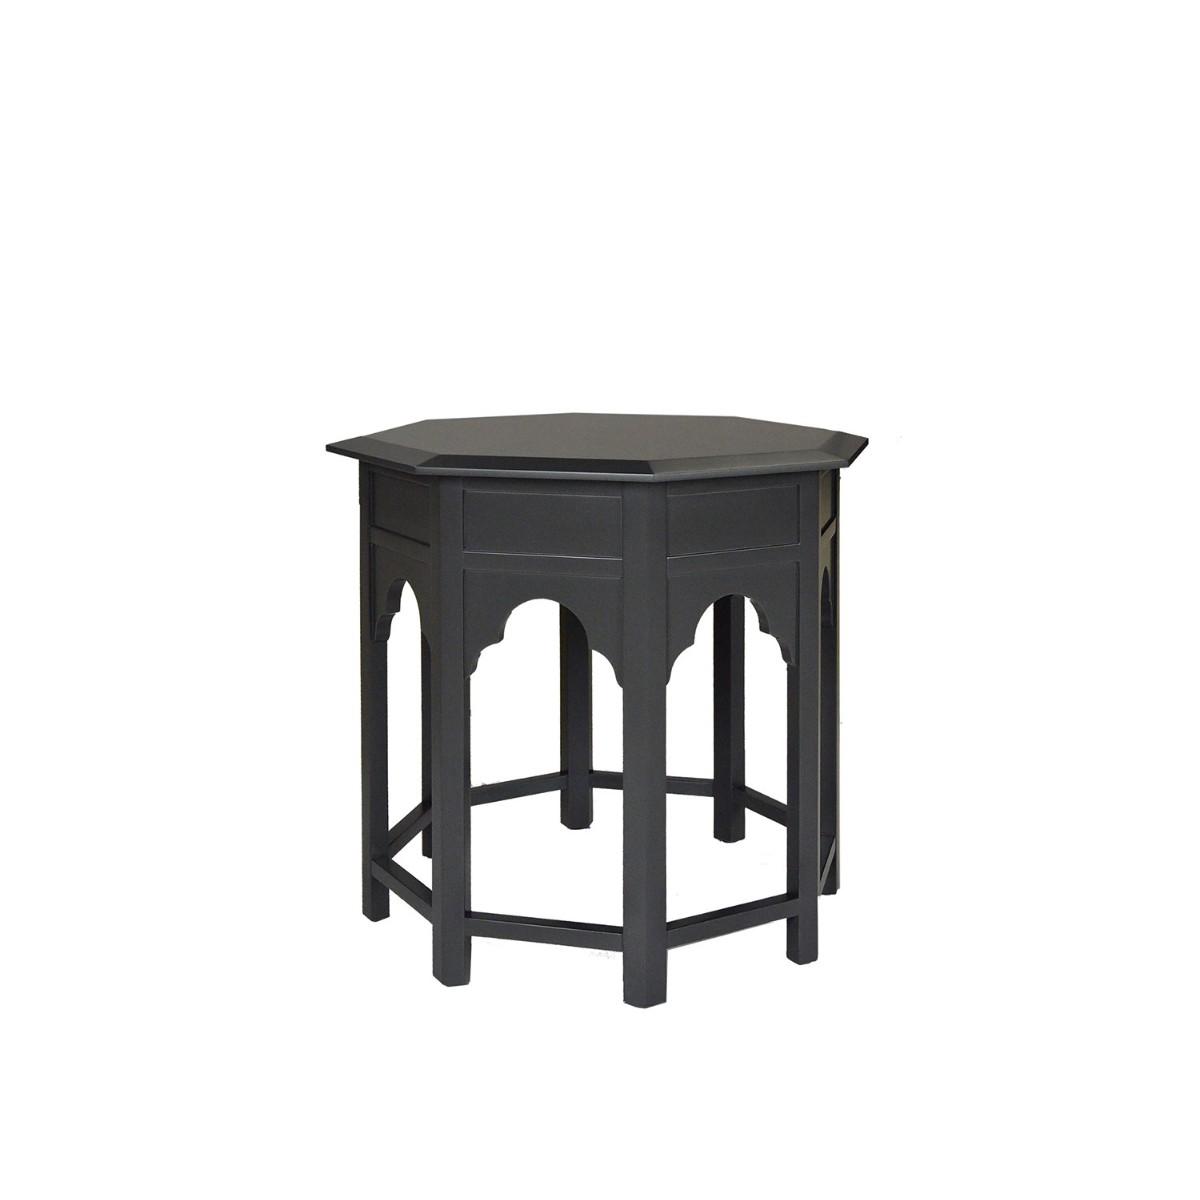 William Yeoward | Tanjina Side Table Charcoal